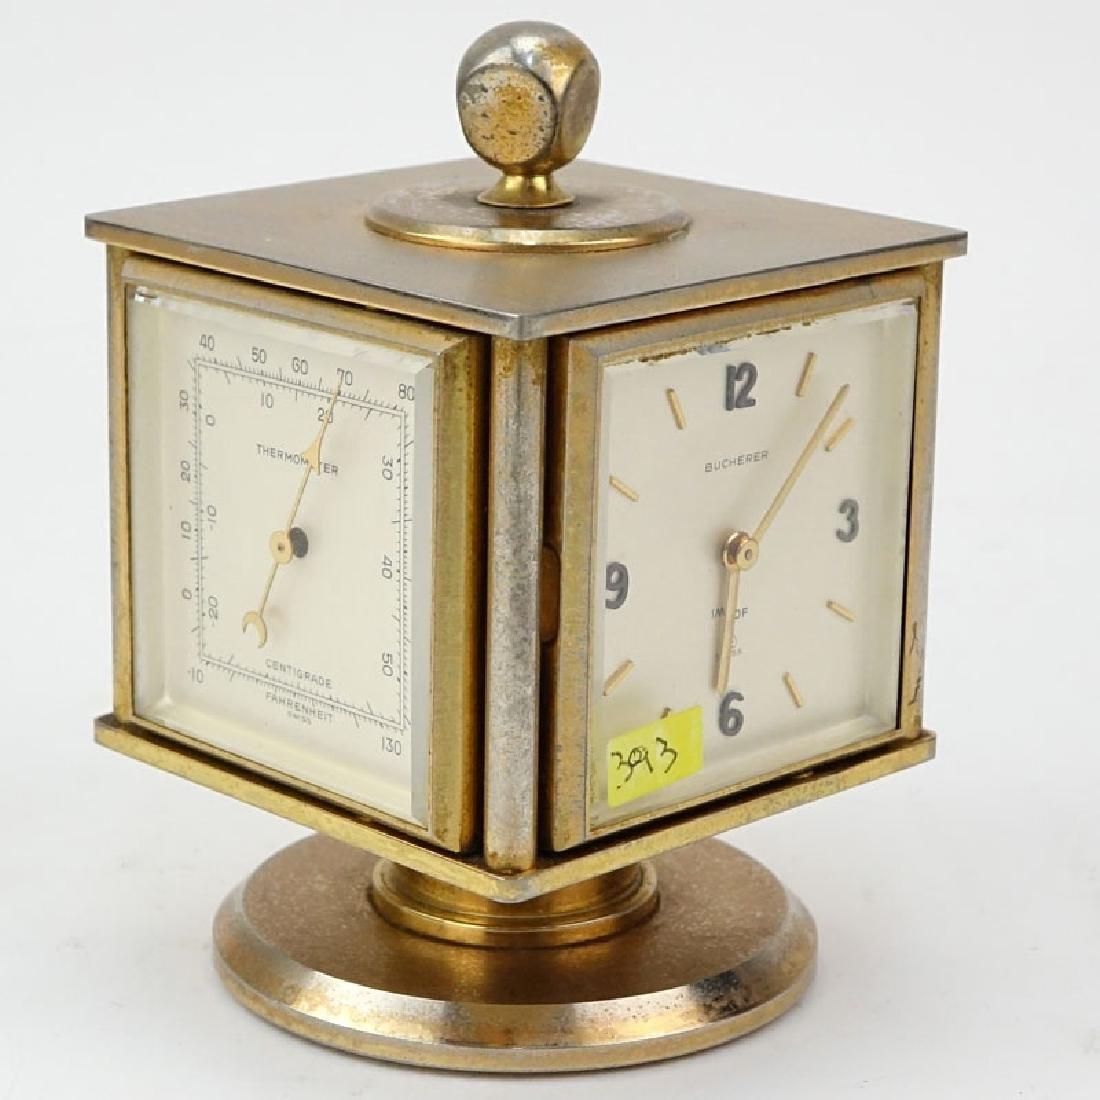 Vintage Bucherer Imhof 4 Sided Art Deco Table Clock. - 4